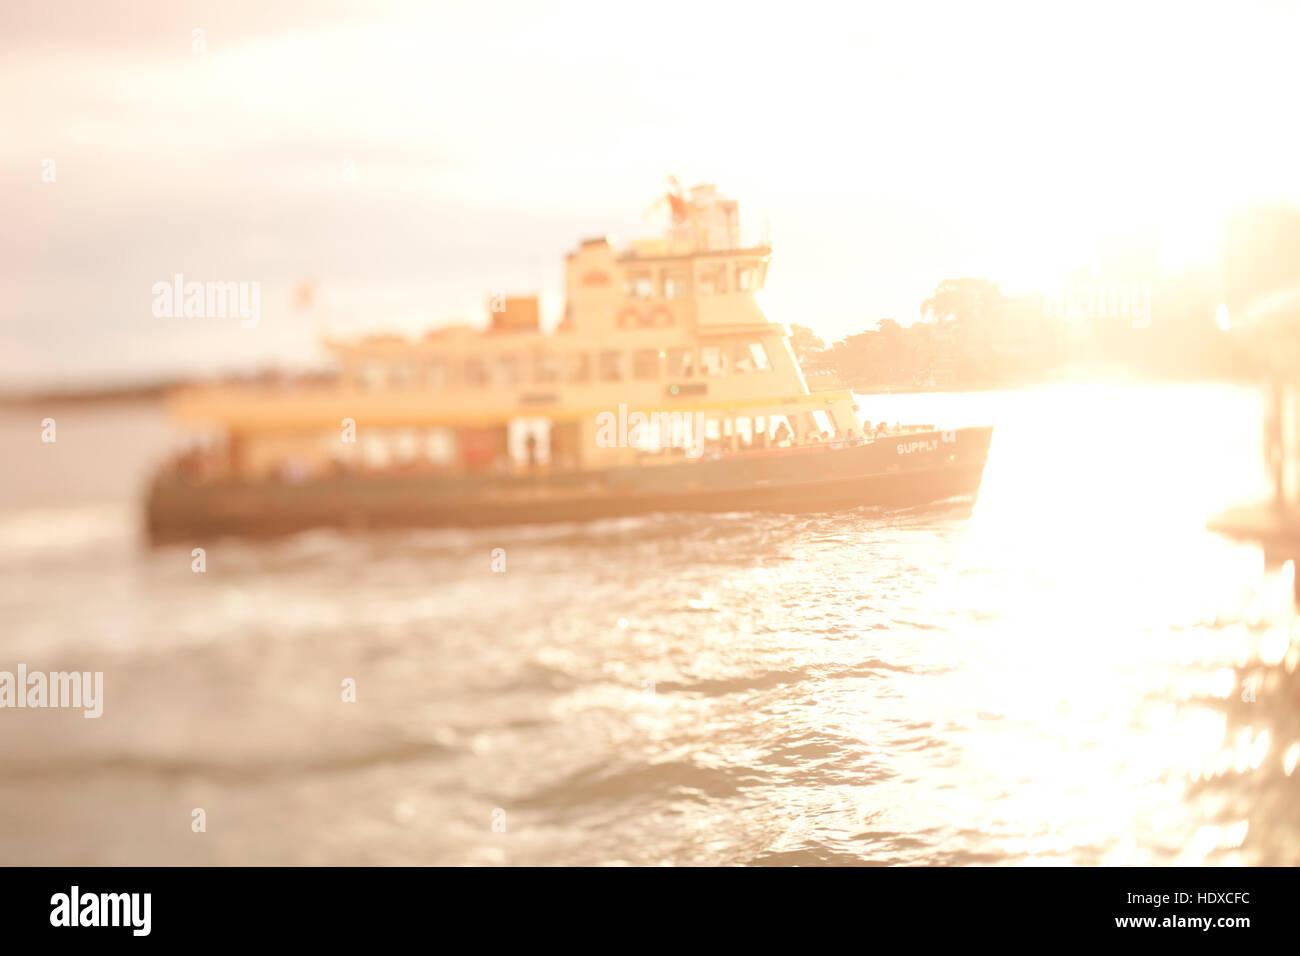 Select focus tilt-shift image of harbor ferry in Sydney Harbor during sunset - Stock Image